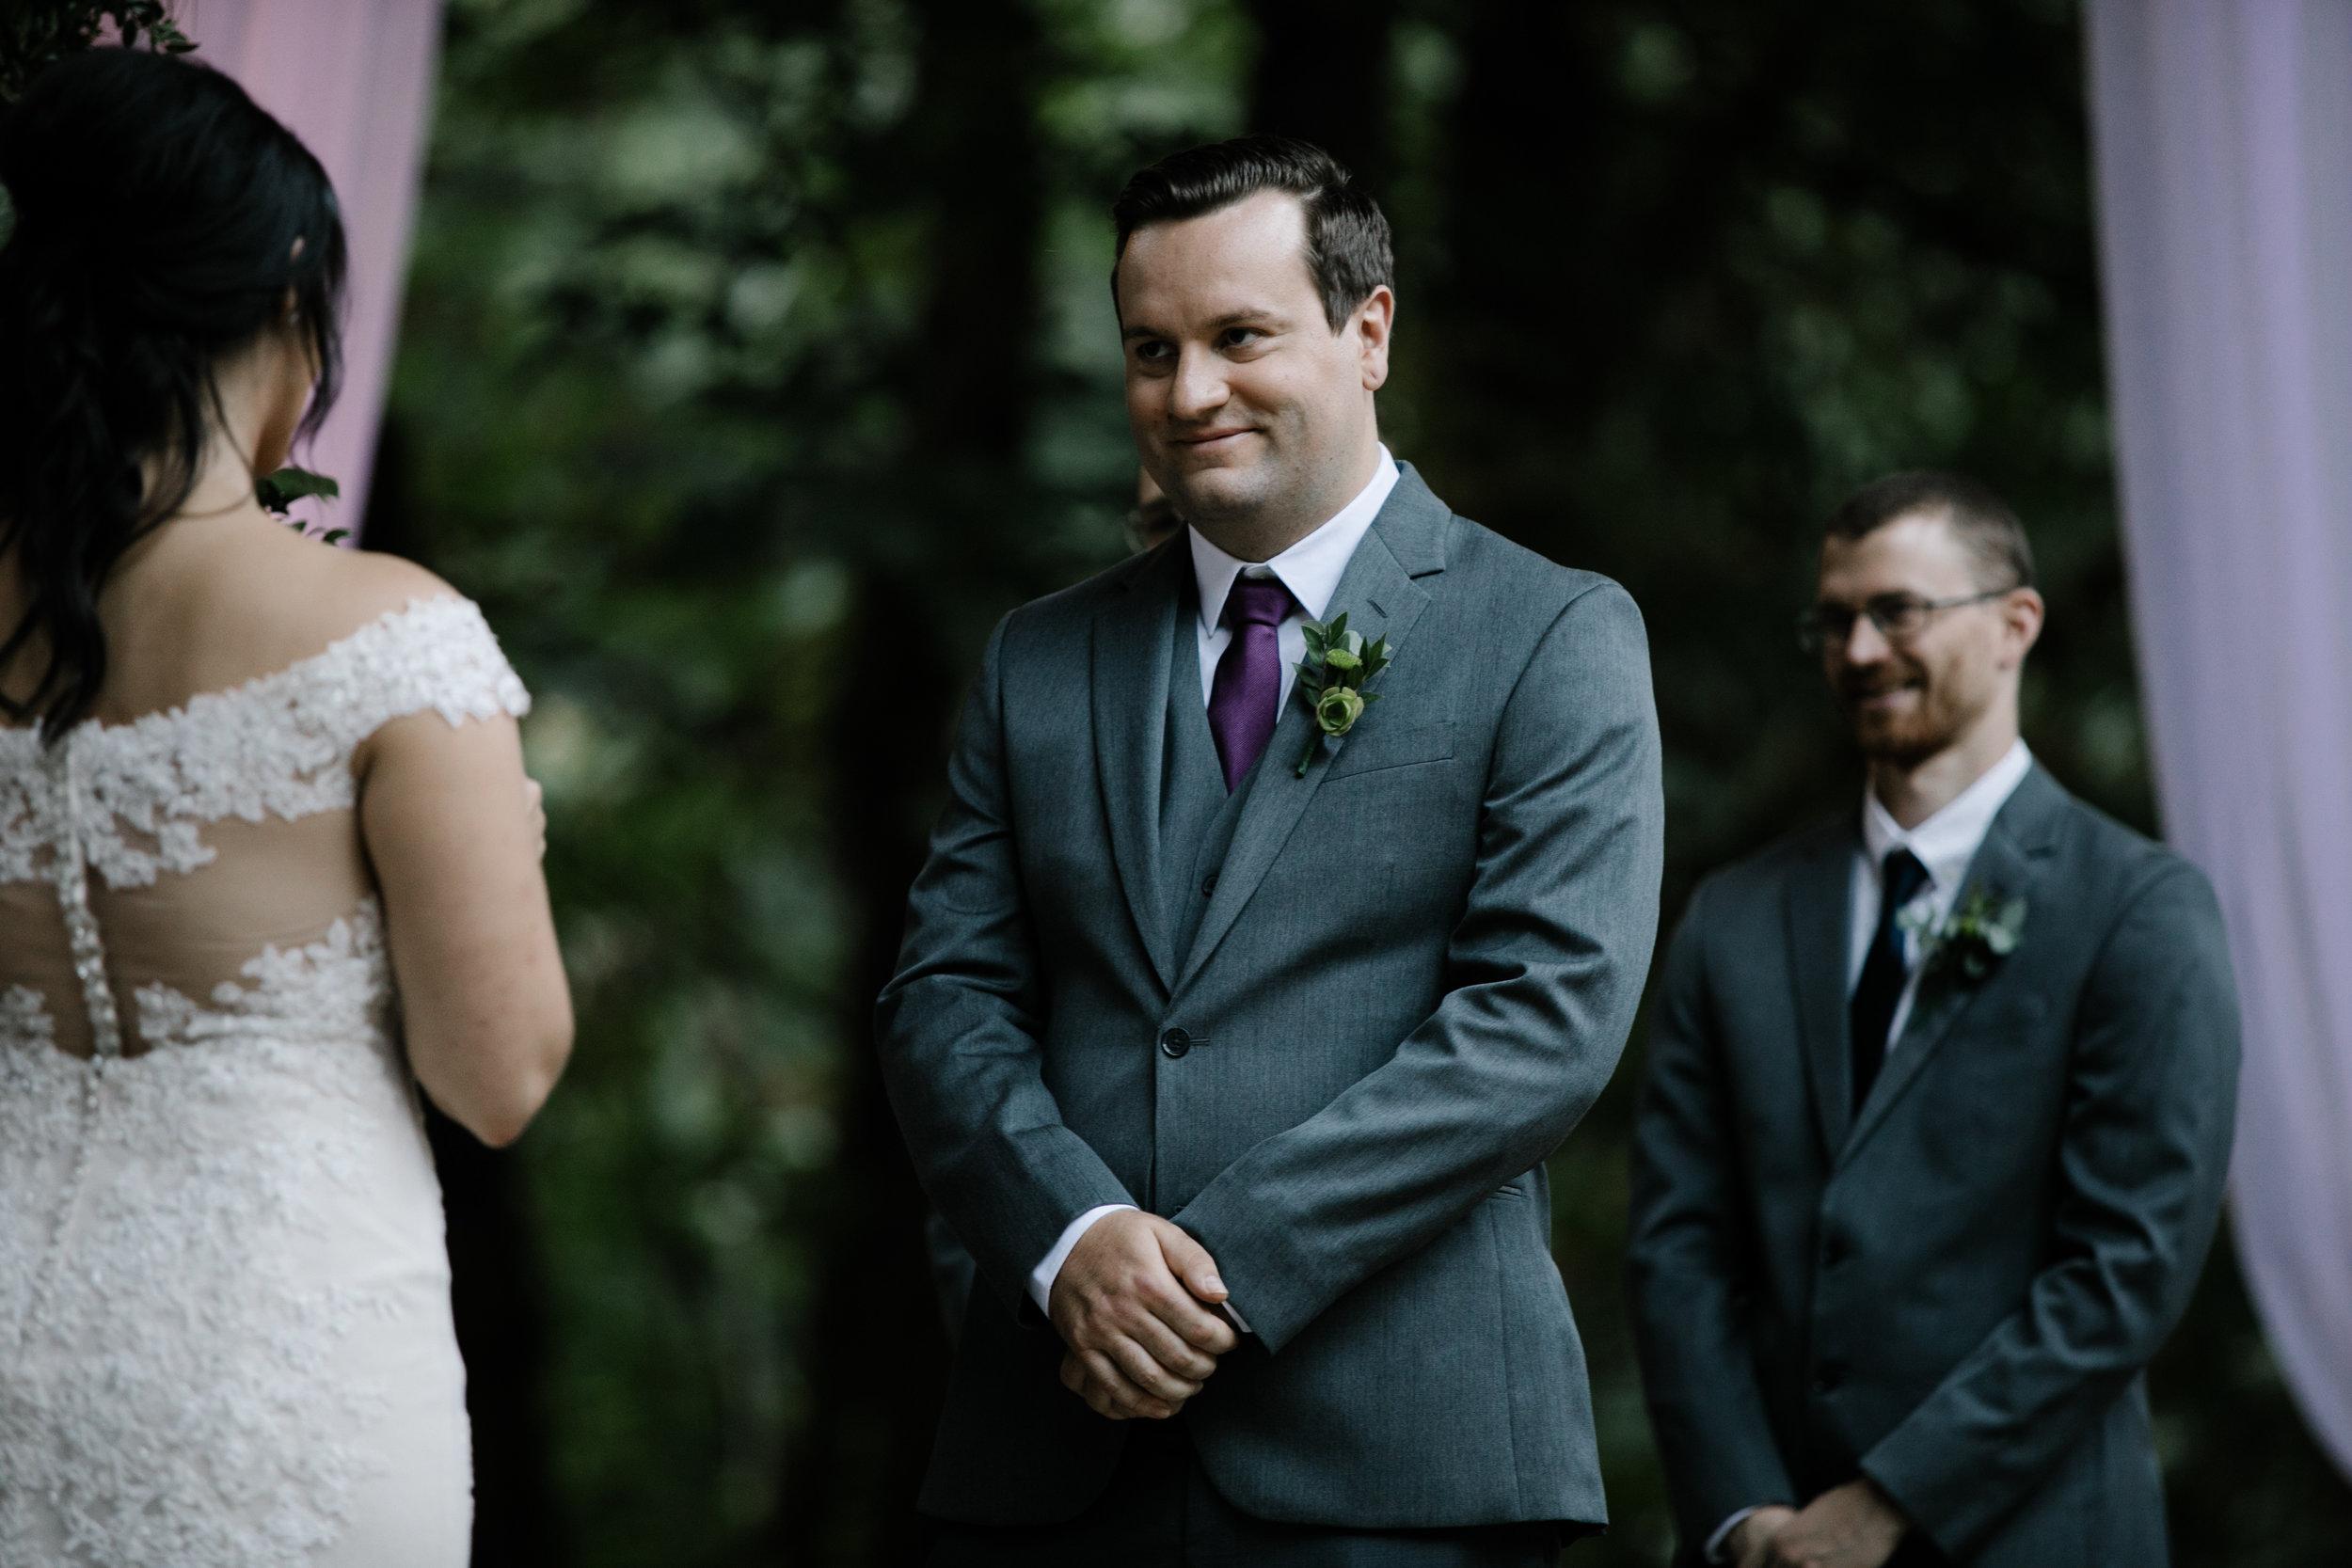 Sevlynn-Photography-Teresa-Chandler-Wedding-53.jpg